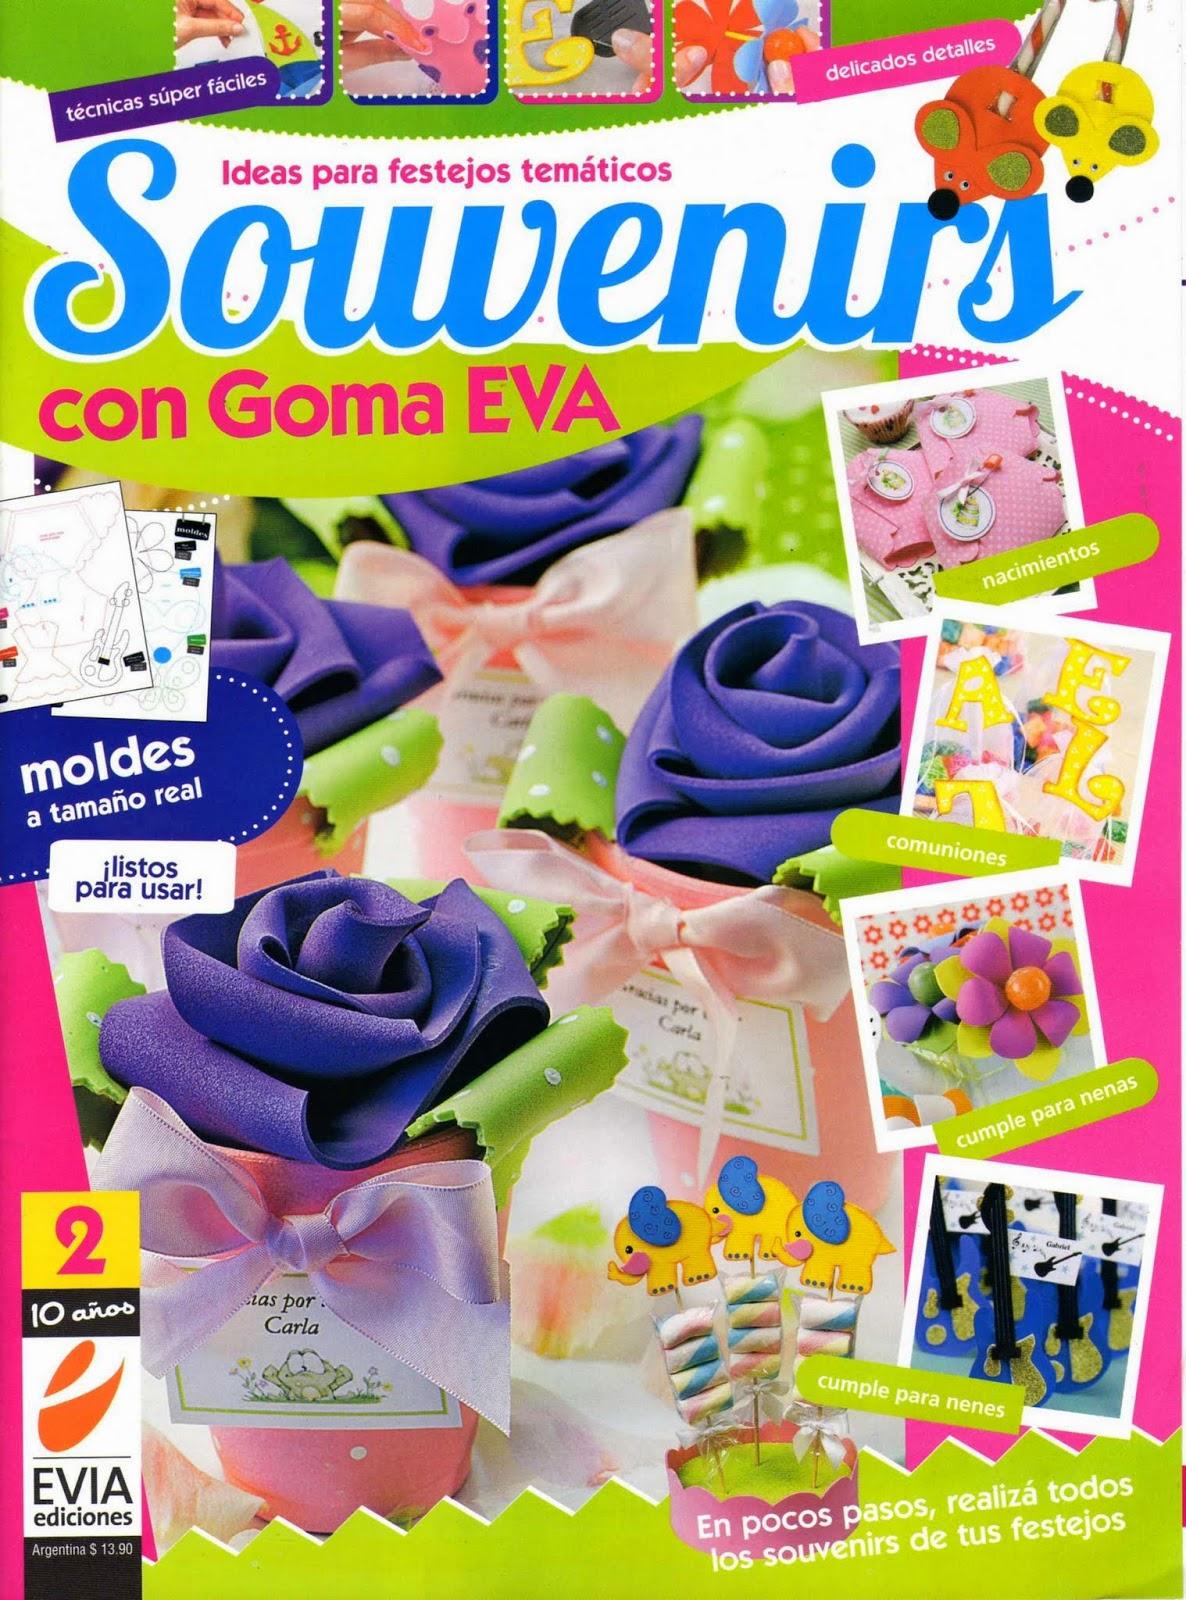 Souvenirs con goma eva paso a paso revistas de for Revistas de decoracion gratis